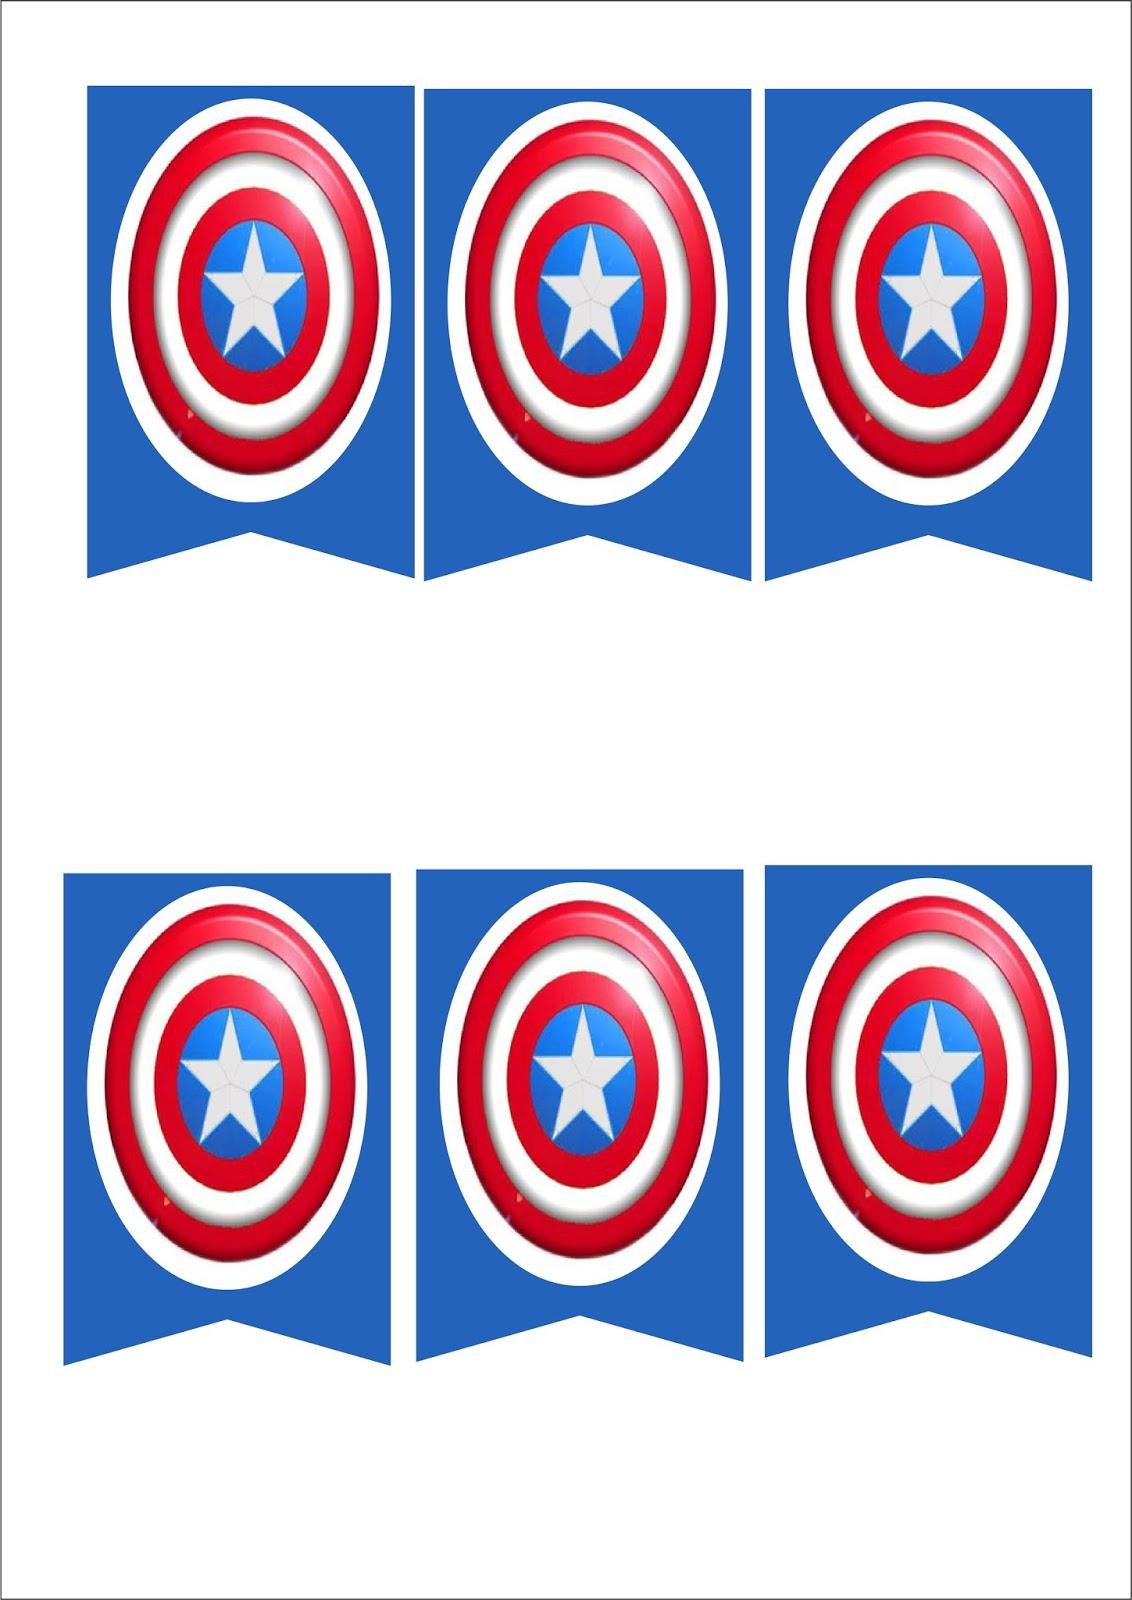 Escudo de capitan america para imprimir - Imagui